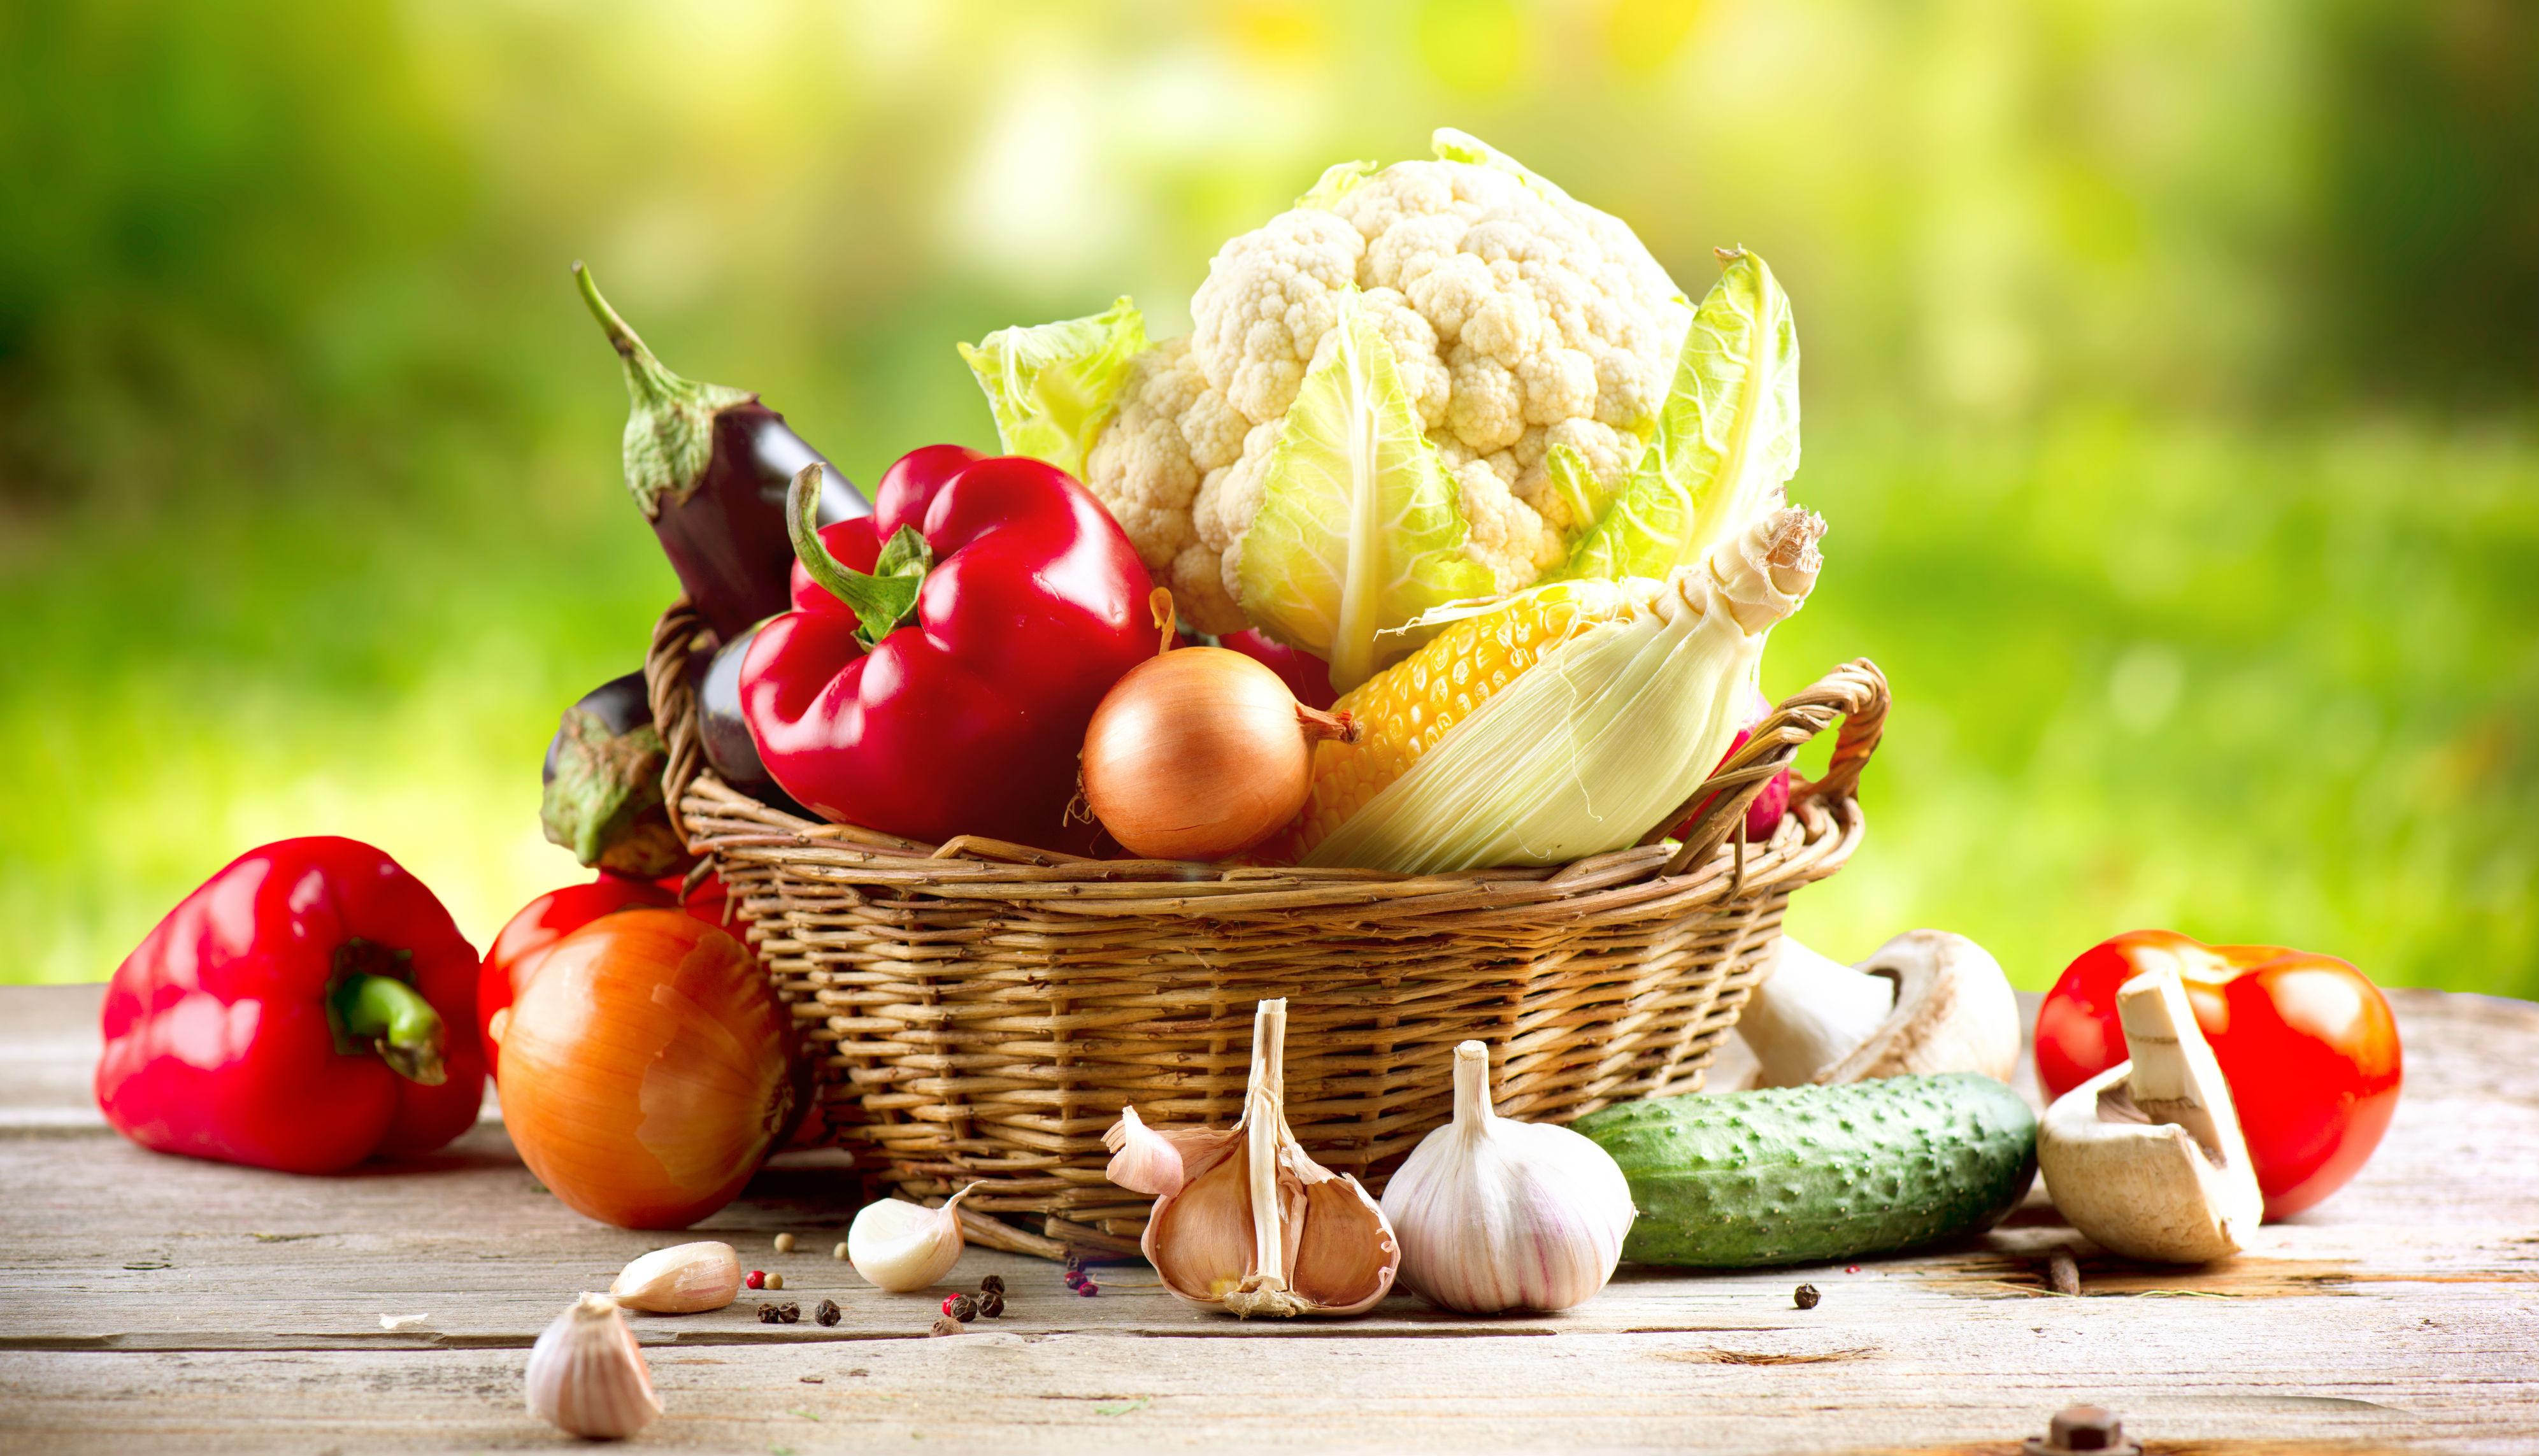 alimentos-bioativos-varios-blog-usenatureza